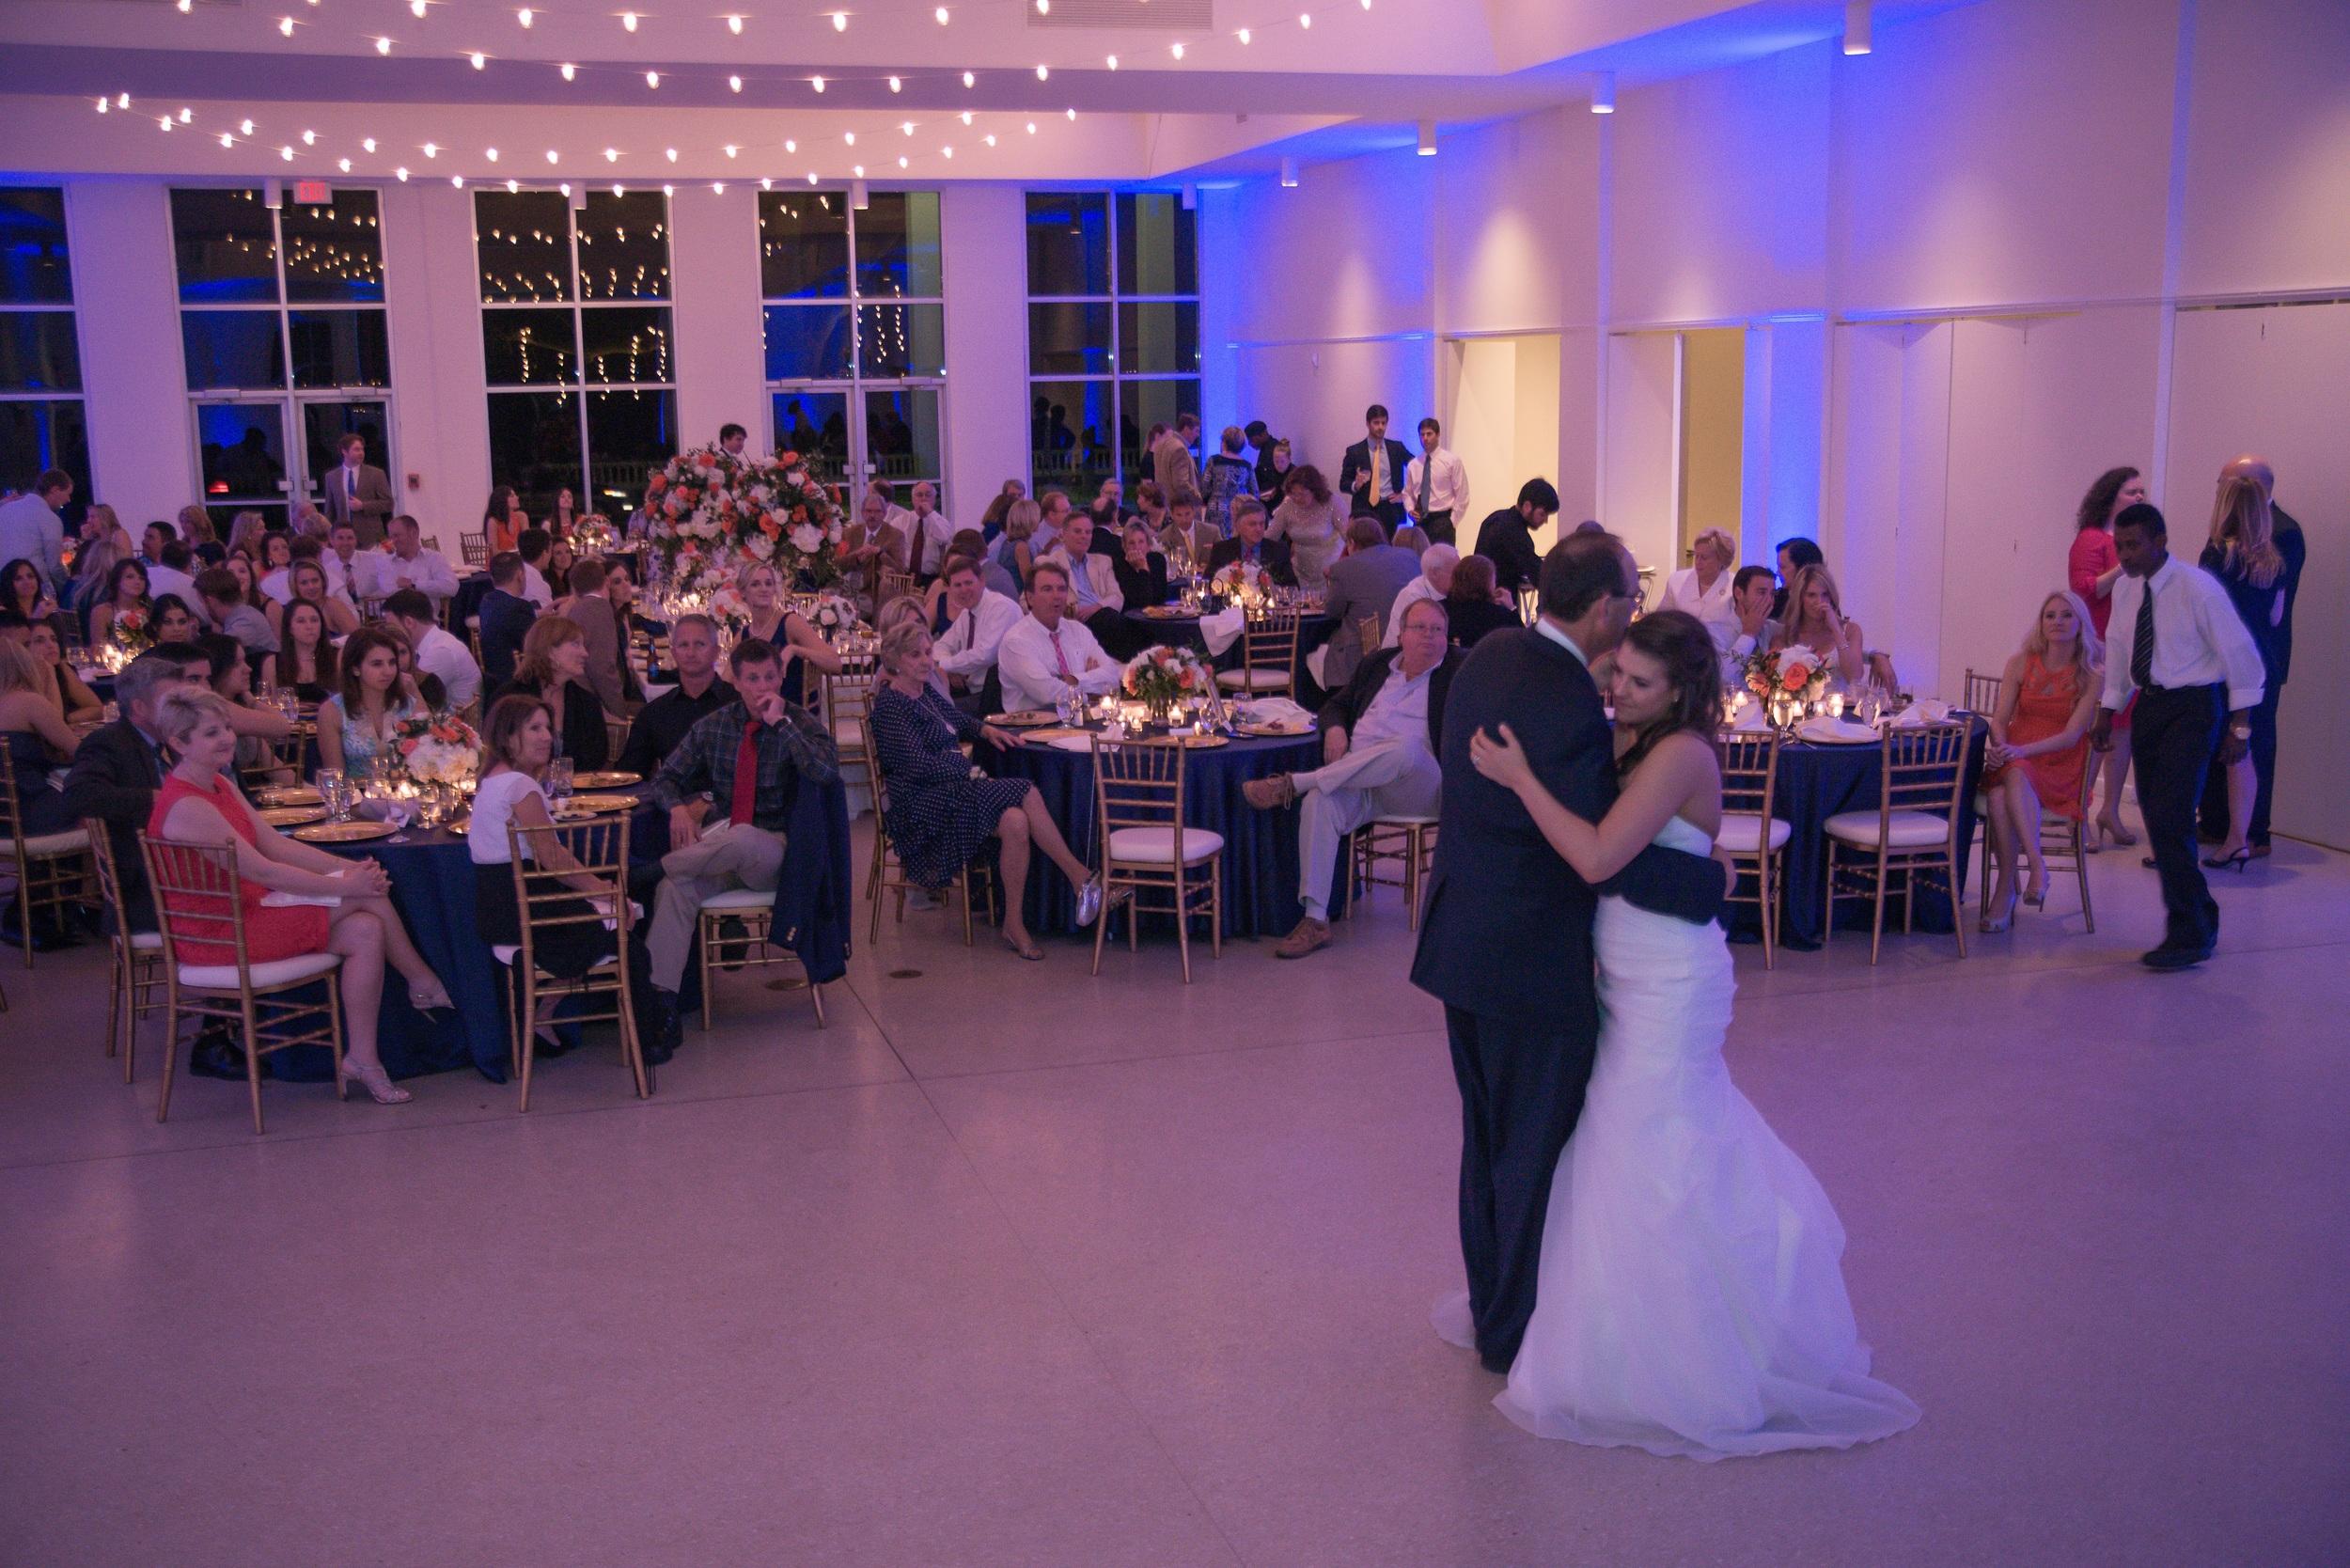 winsor event studio tampa garden club wedding reception uplight blue